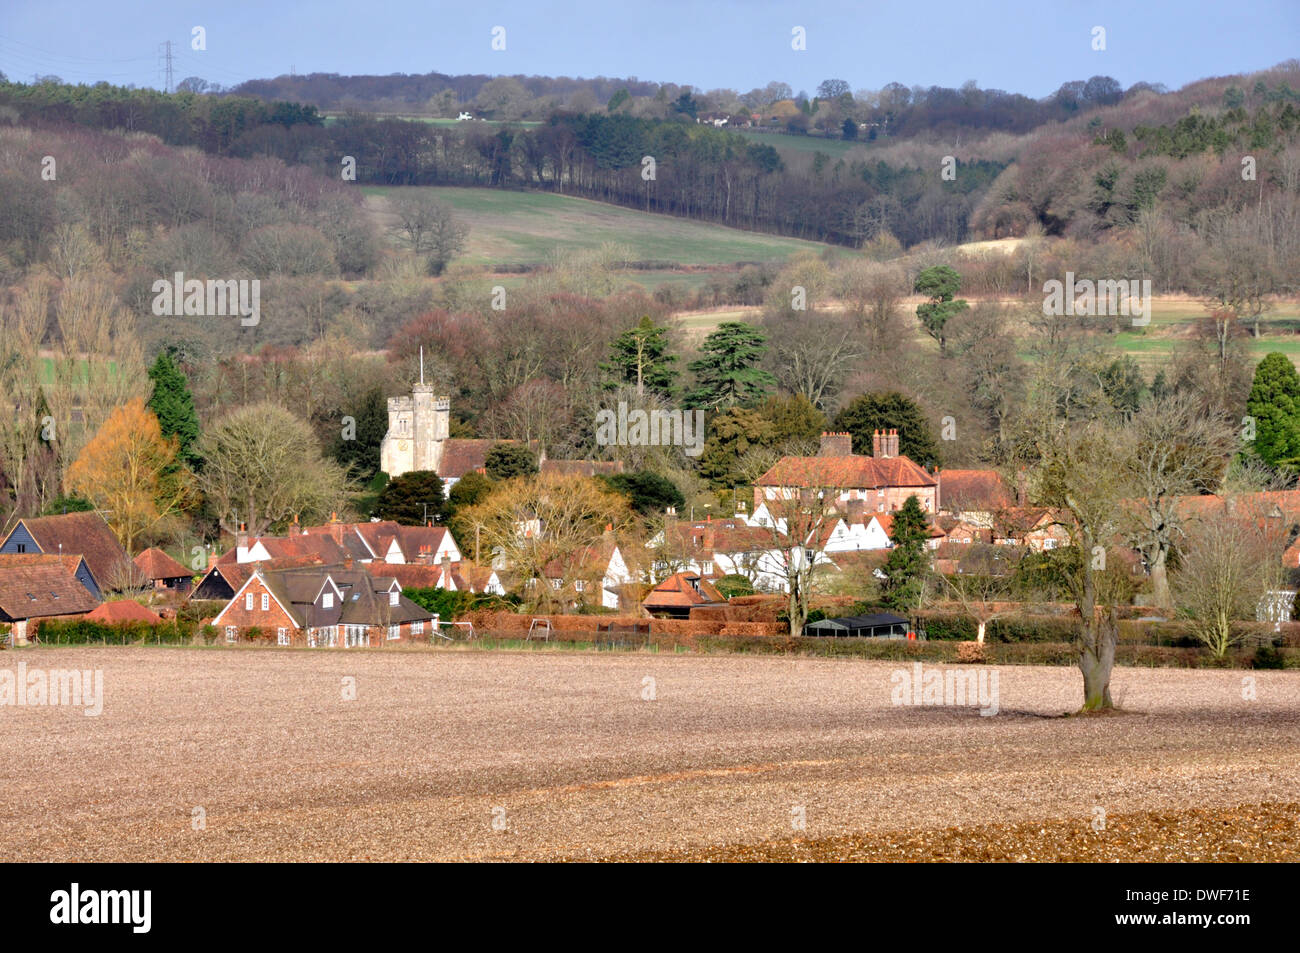 Bucks - Chiltern Hills - sunlit winter landscape - Little Missenden village - backdrop wooded hillsides - subtle muted colours - Stock Image